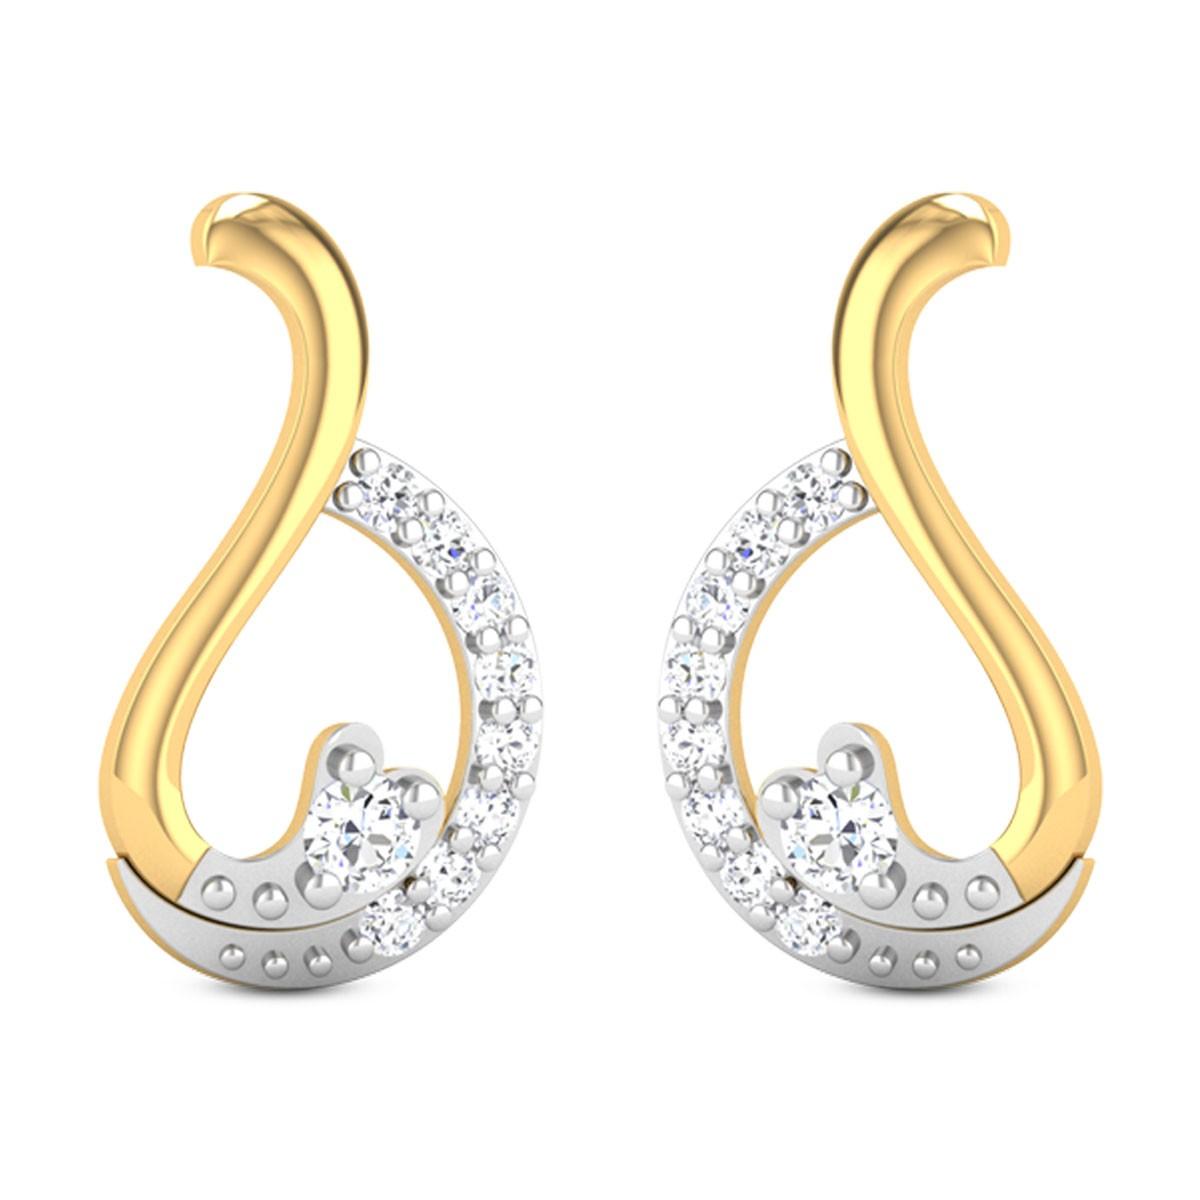 Lola Diamond Earrings